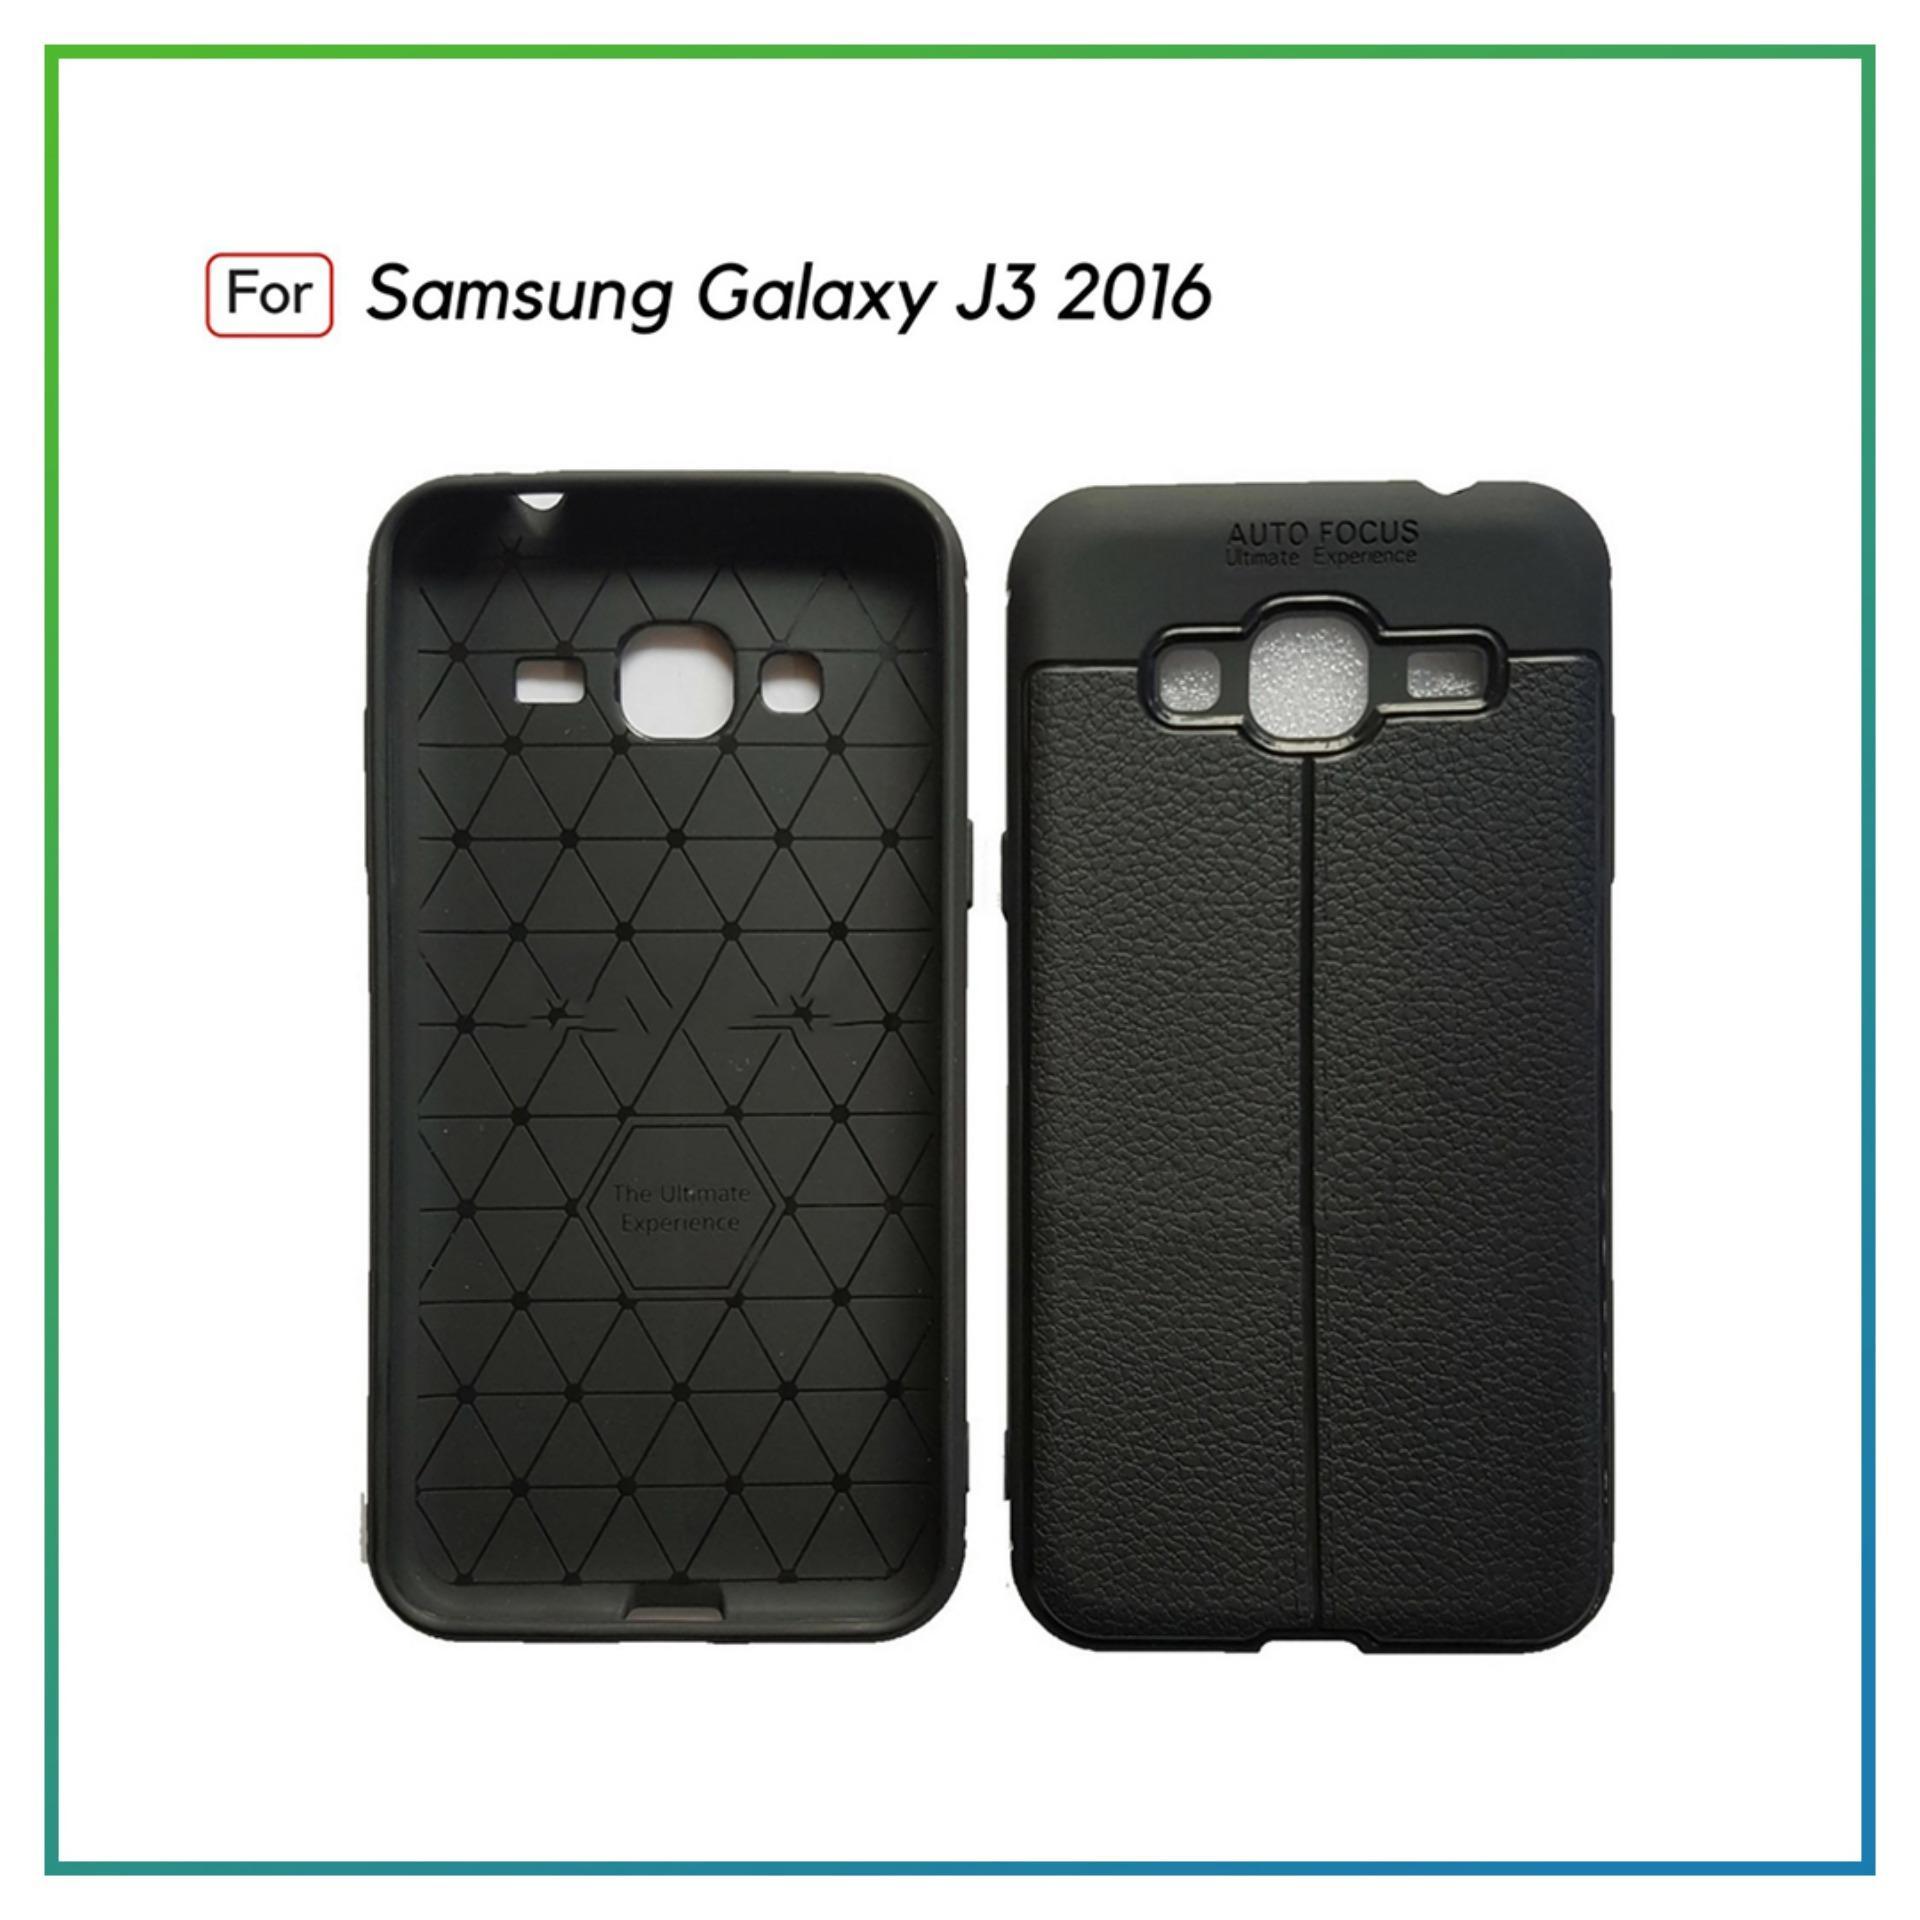 casinghp Super Premium Ultimate Shockproof Leather Case For Samsung Galaxy J3 2016 - Black